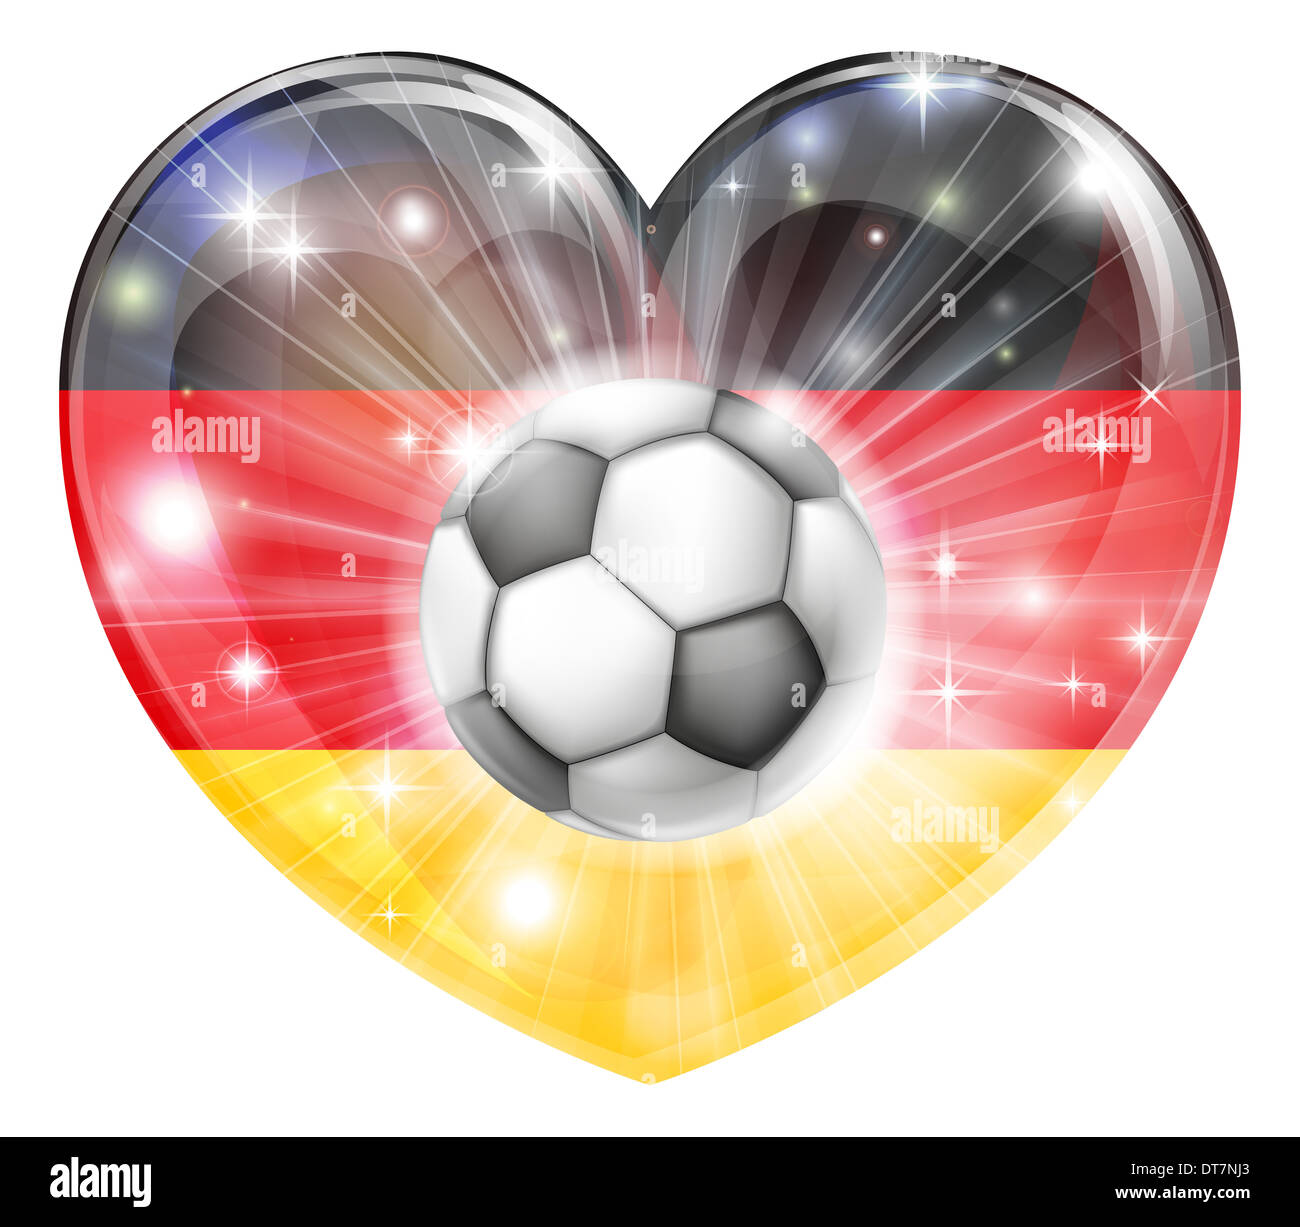 Deutschland Fussball Fussball Ball Fahne Liebe Herz Konzept